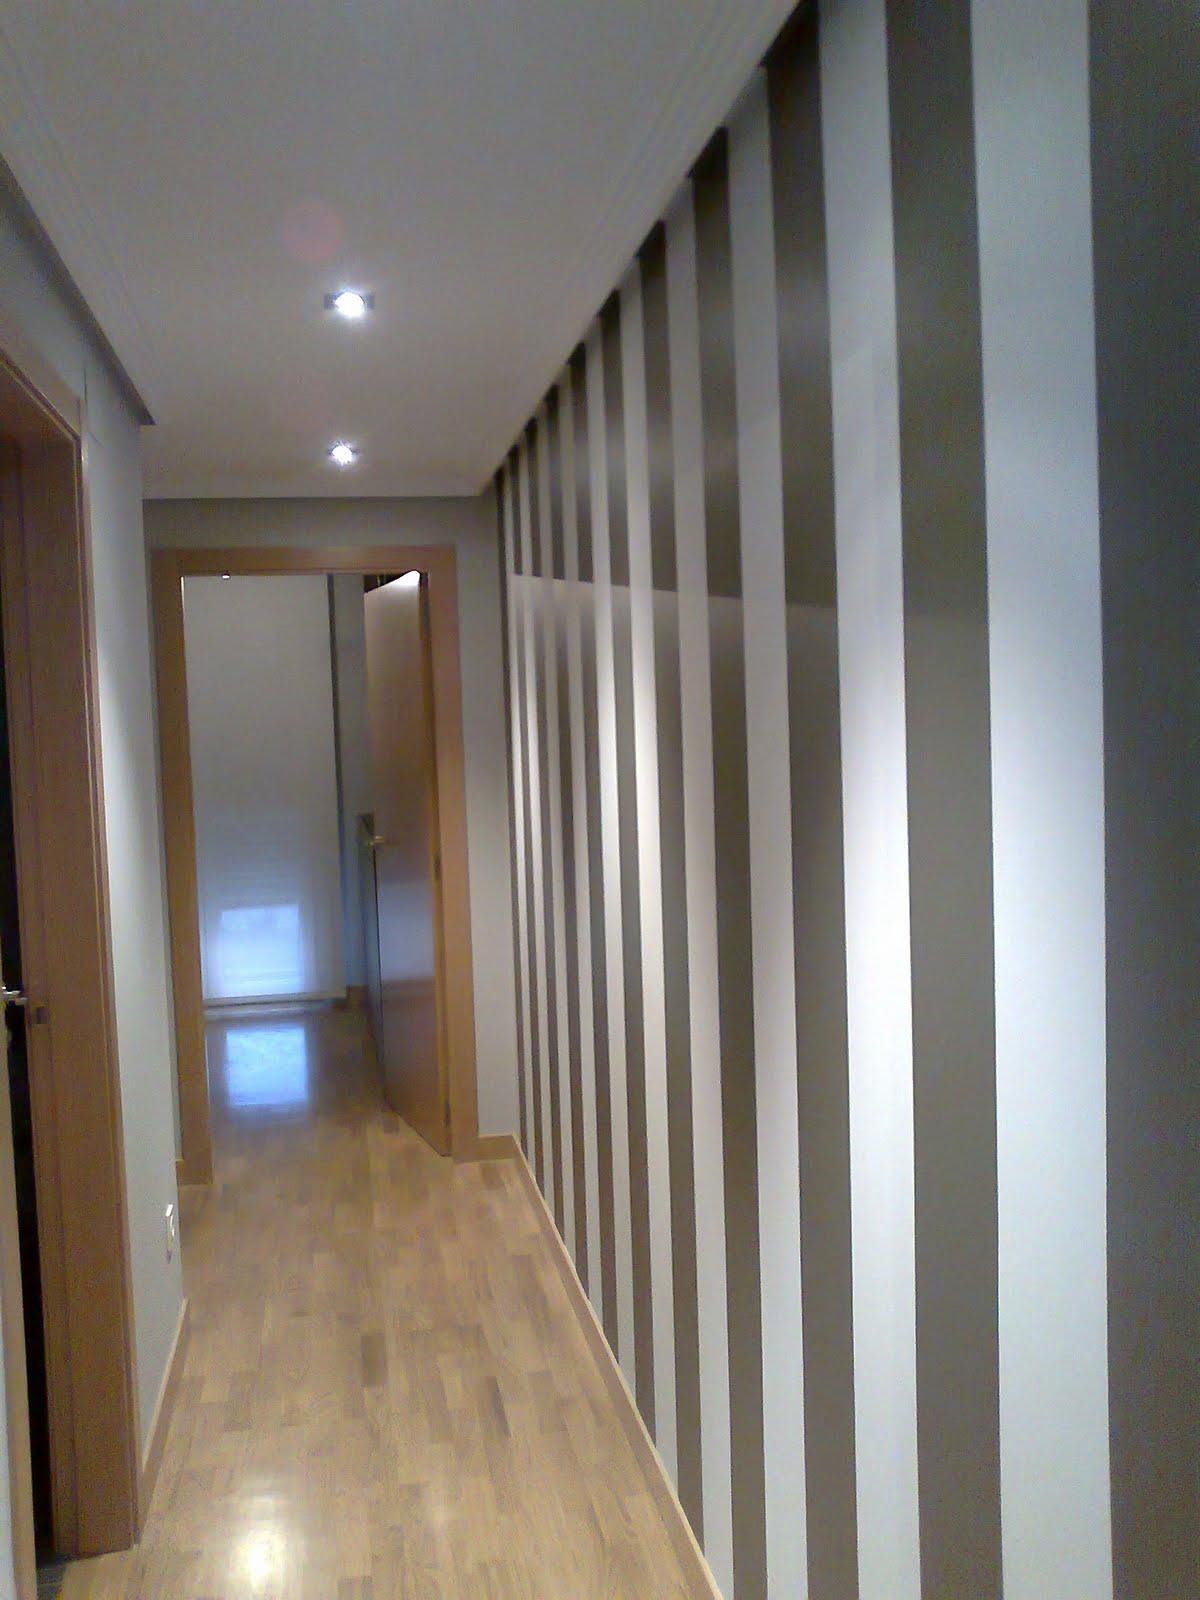 Pinturas aguado s l decoracion rayas pasillo viteri - Pinturas para pasillos ...